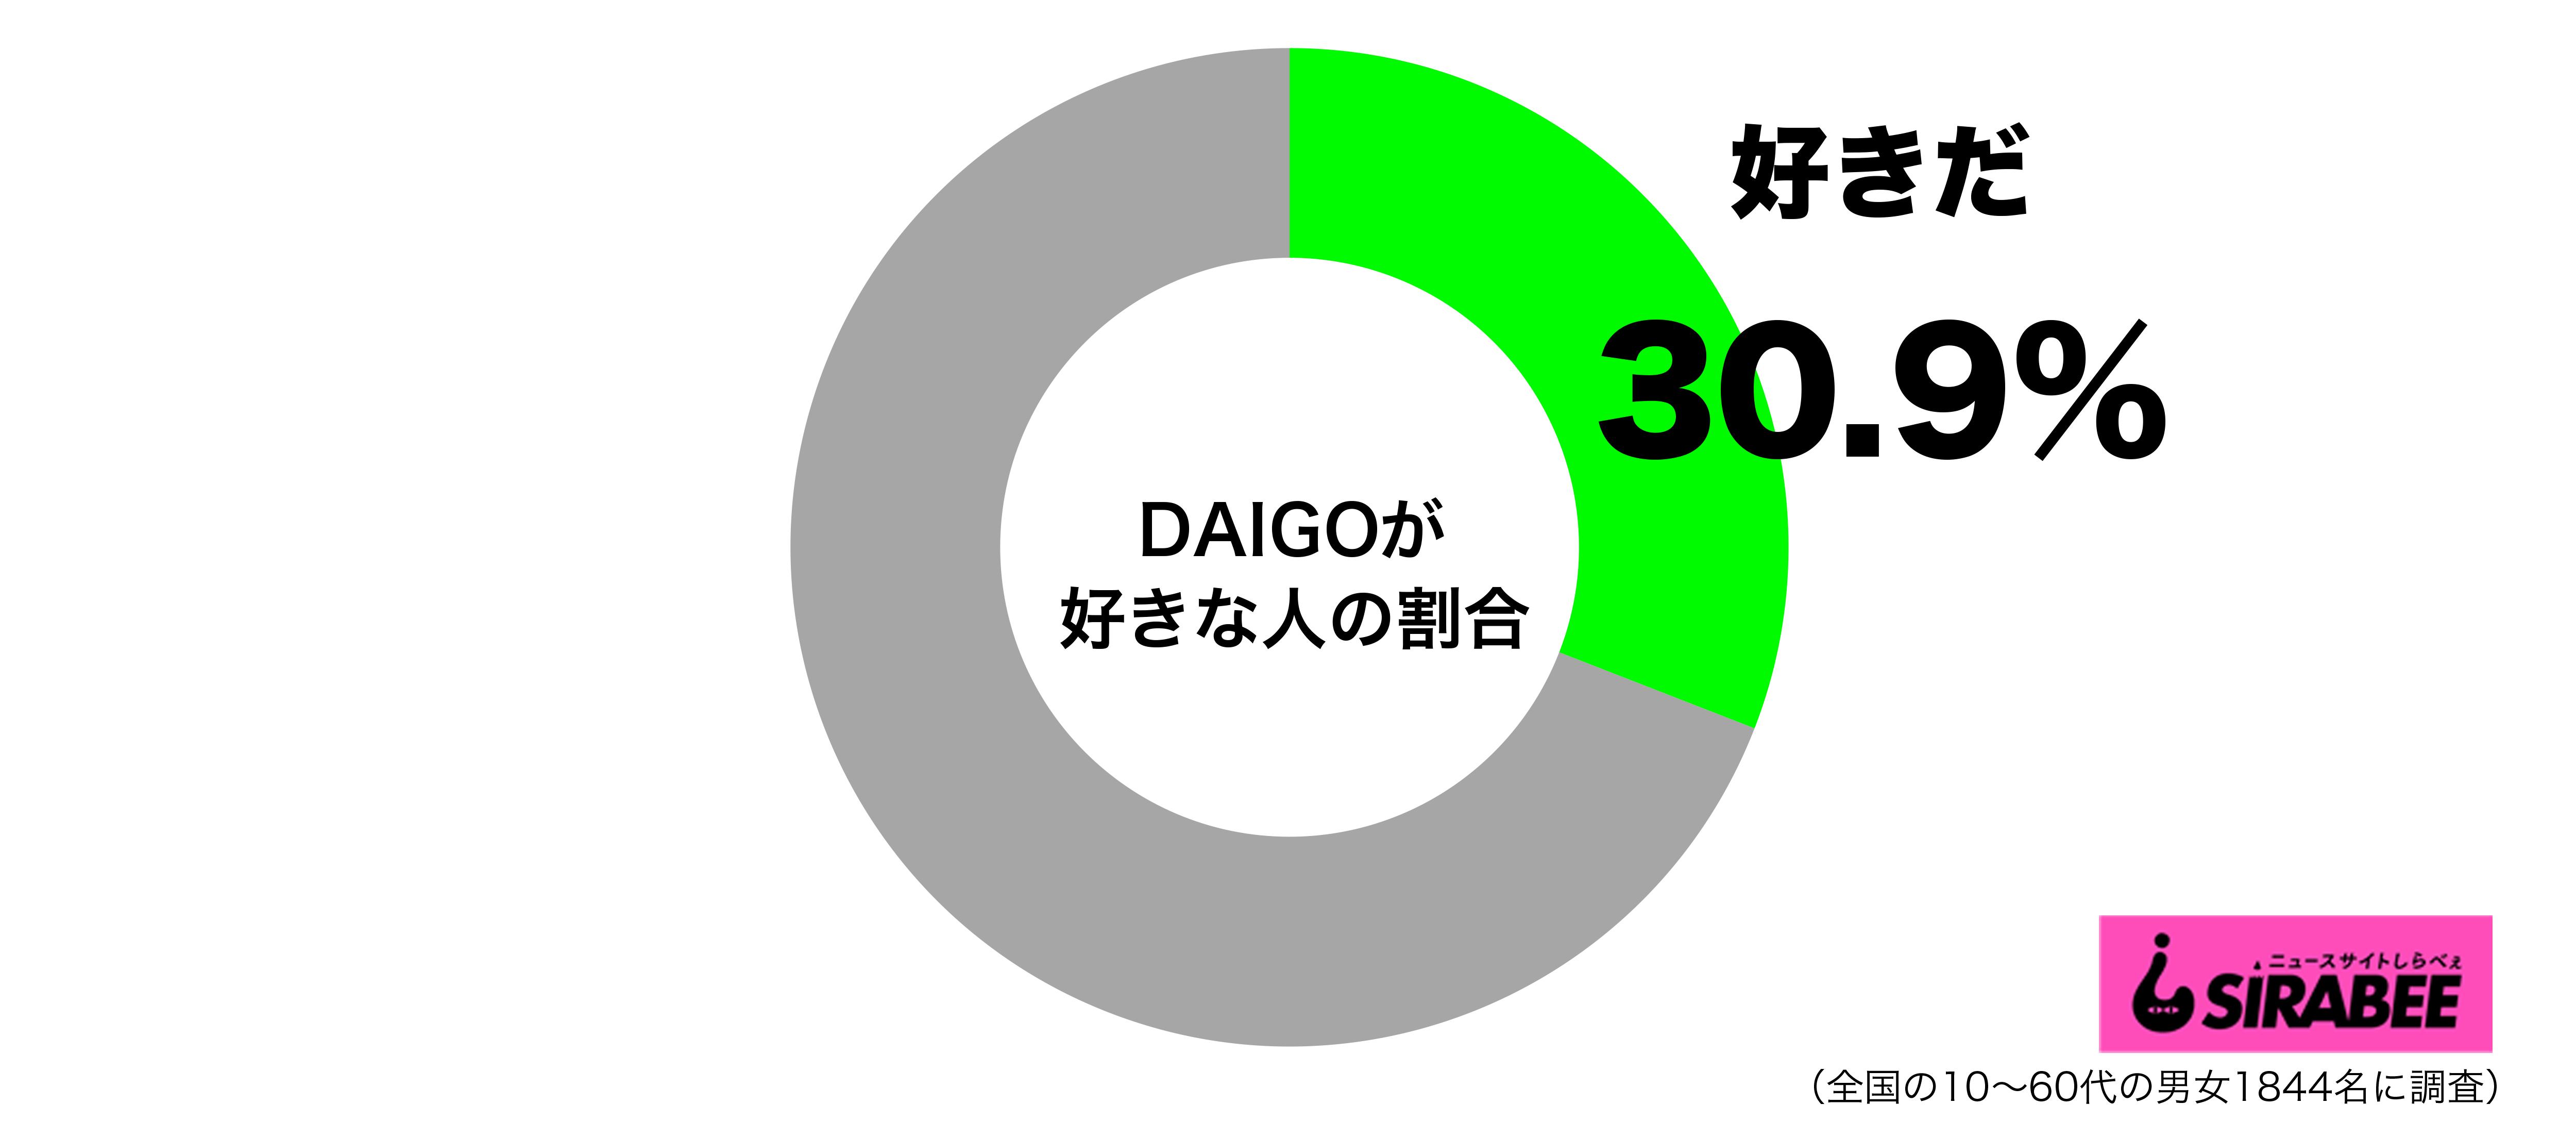 DAIGOが好きグラフ